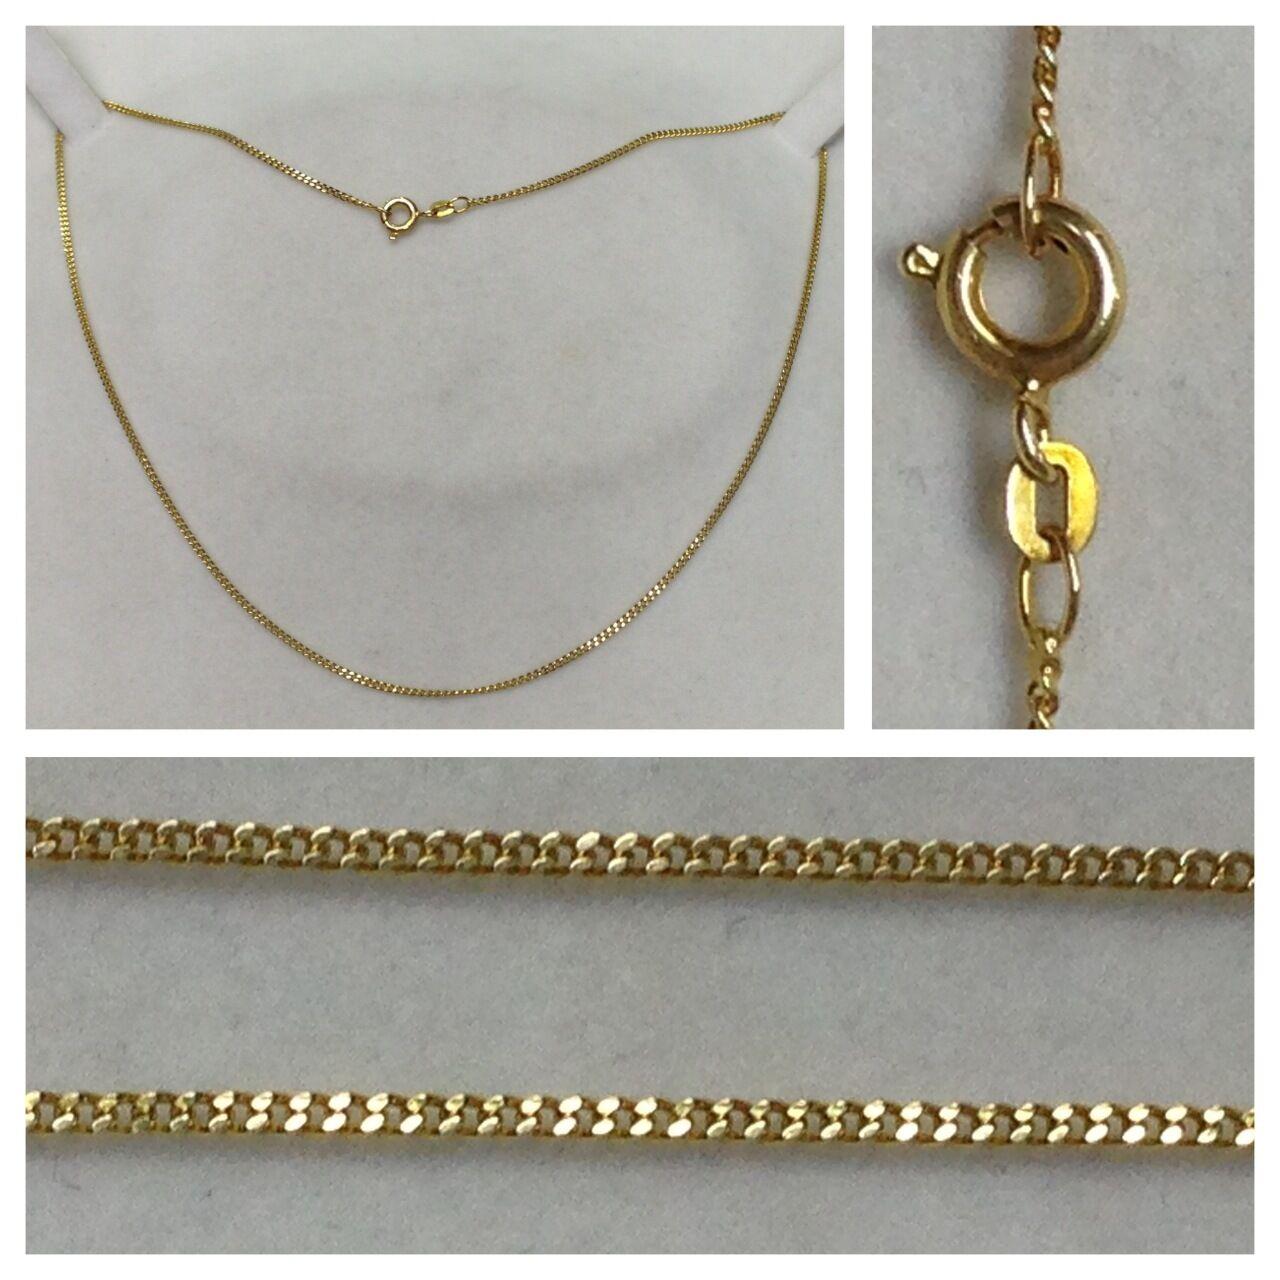 Collar 585er gold Joya De gold Collar de gold Collar 39cm